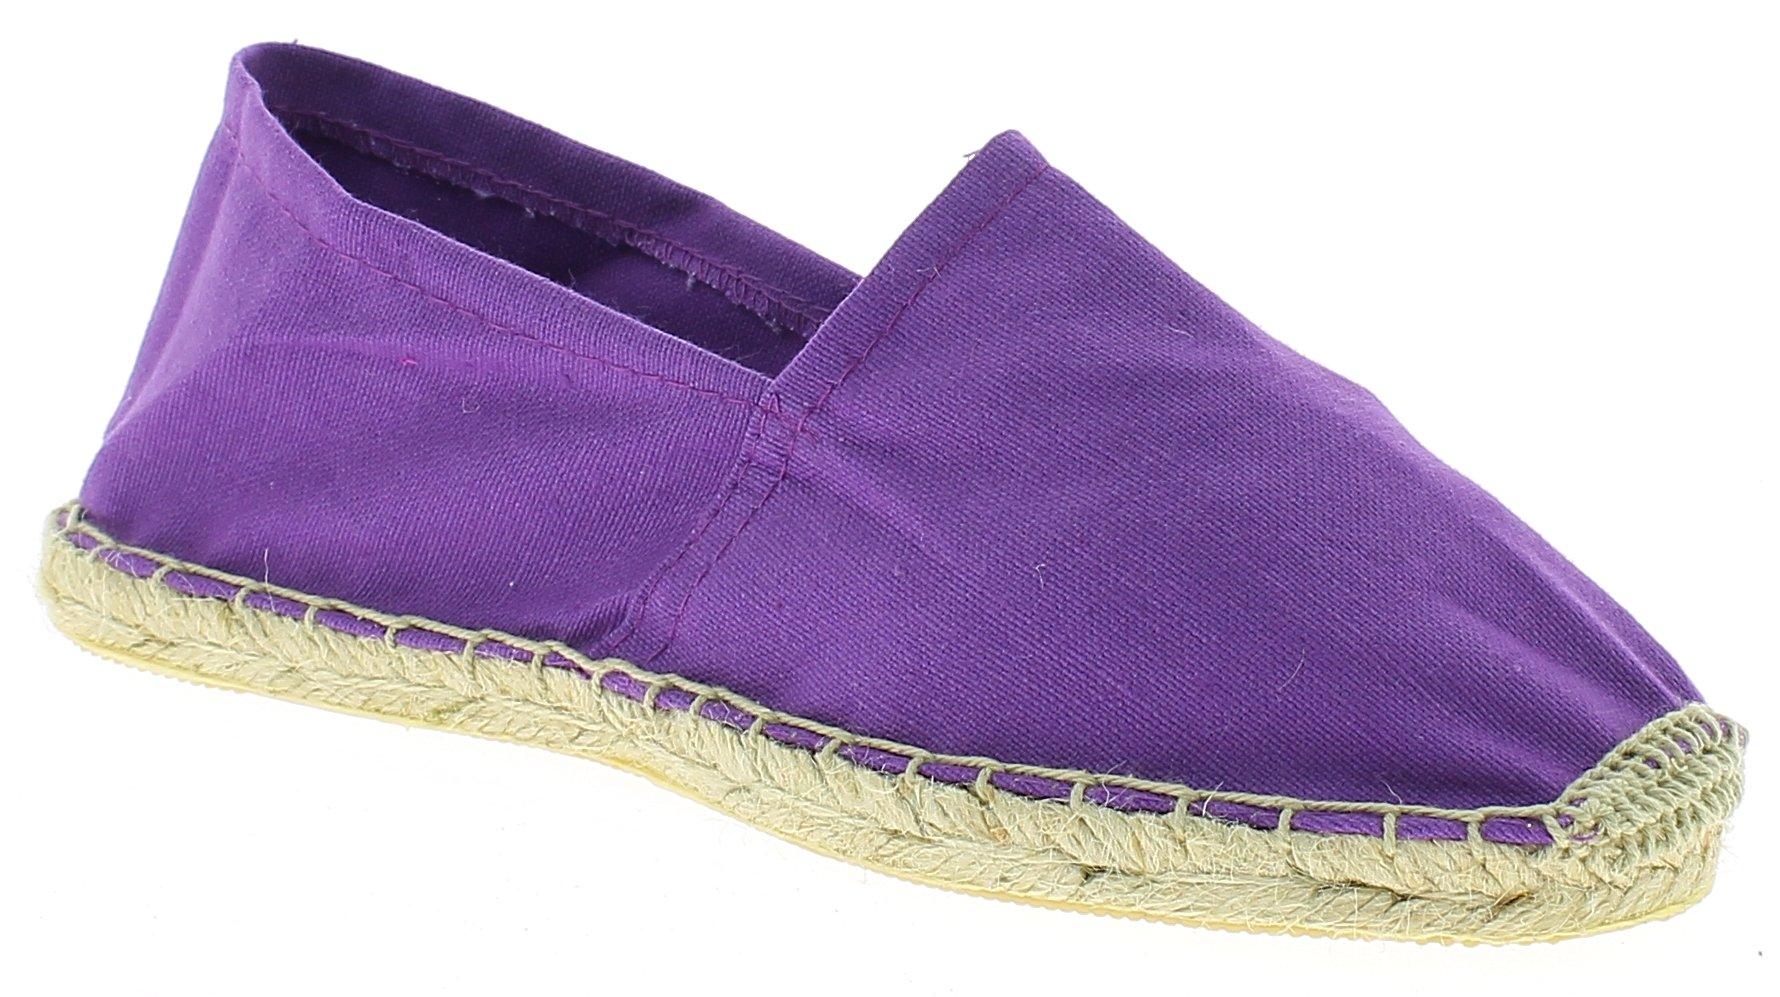 MADIGAN Γυναικεία Casual ESPAGNA Μωβ - IqShoes - ESPAGNA VIOLA-purple-38/1/61/11 προϊόντα παπούτσια